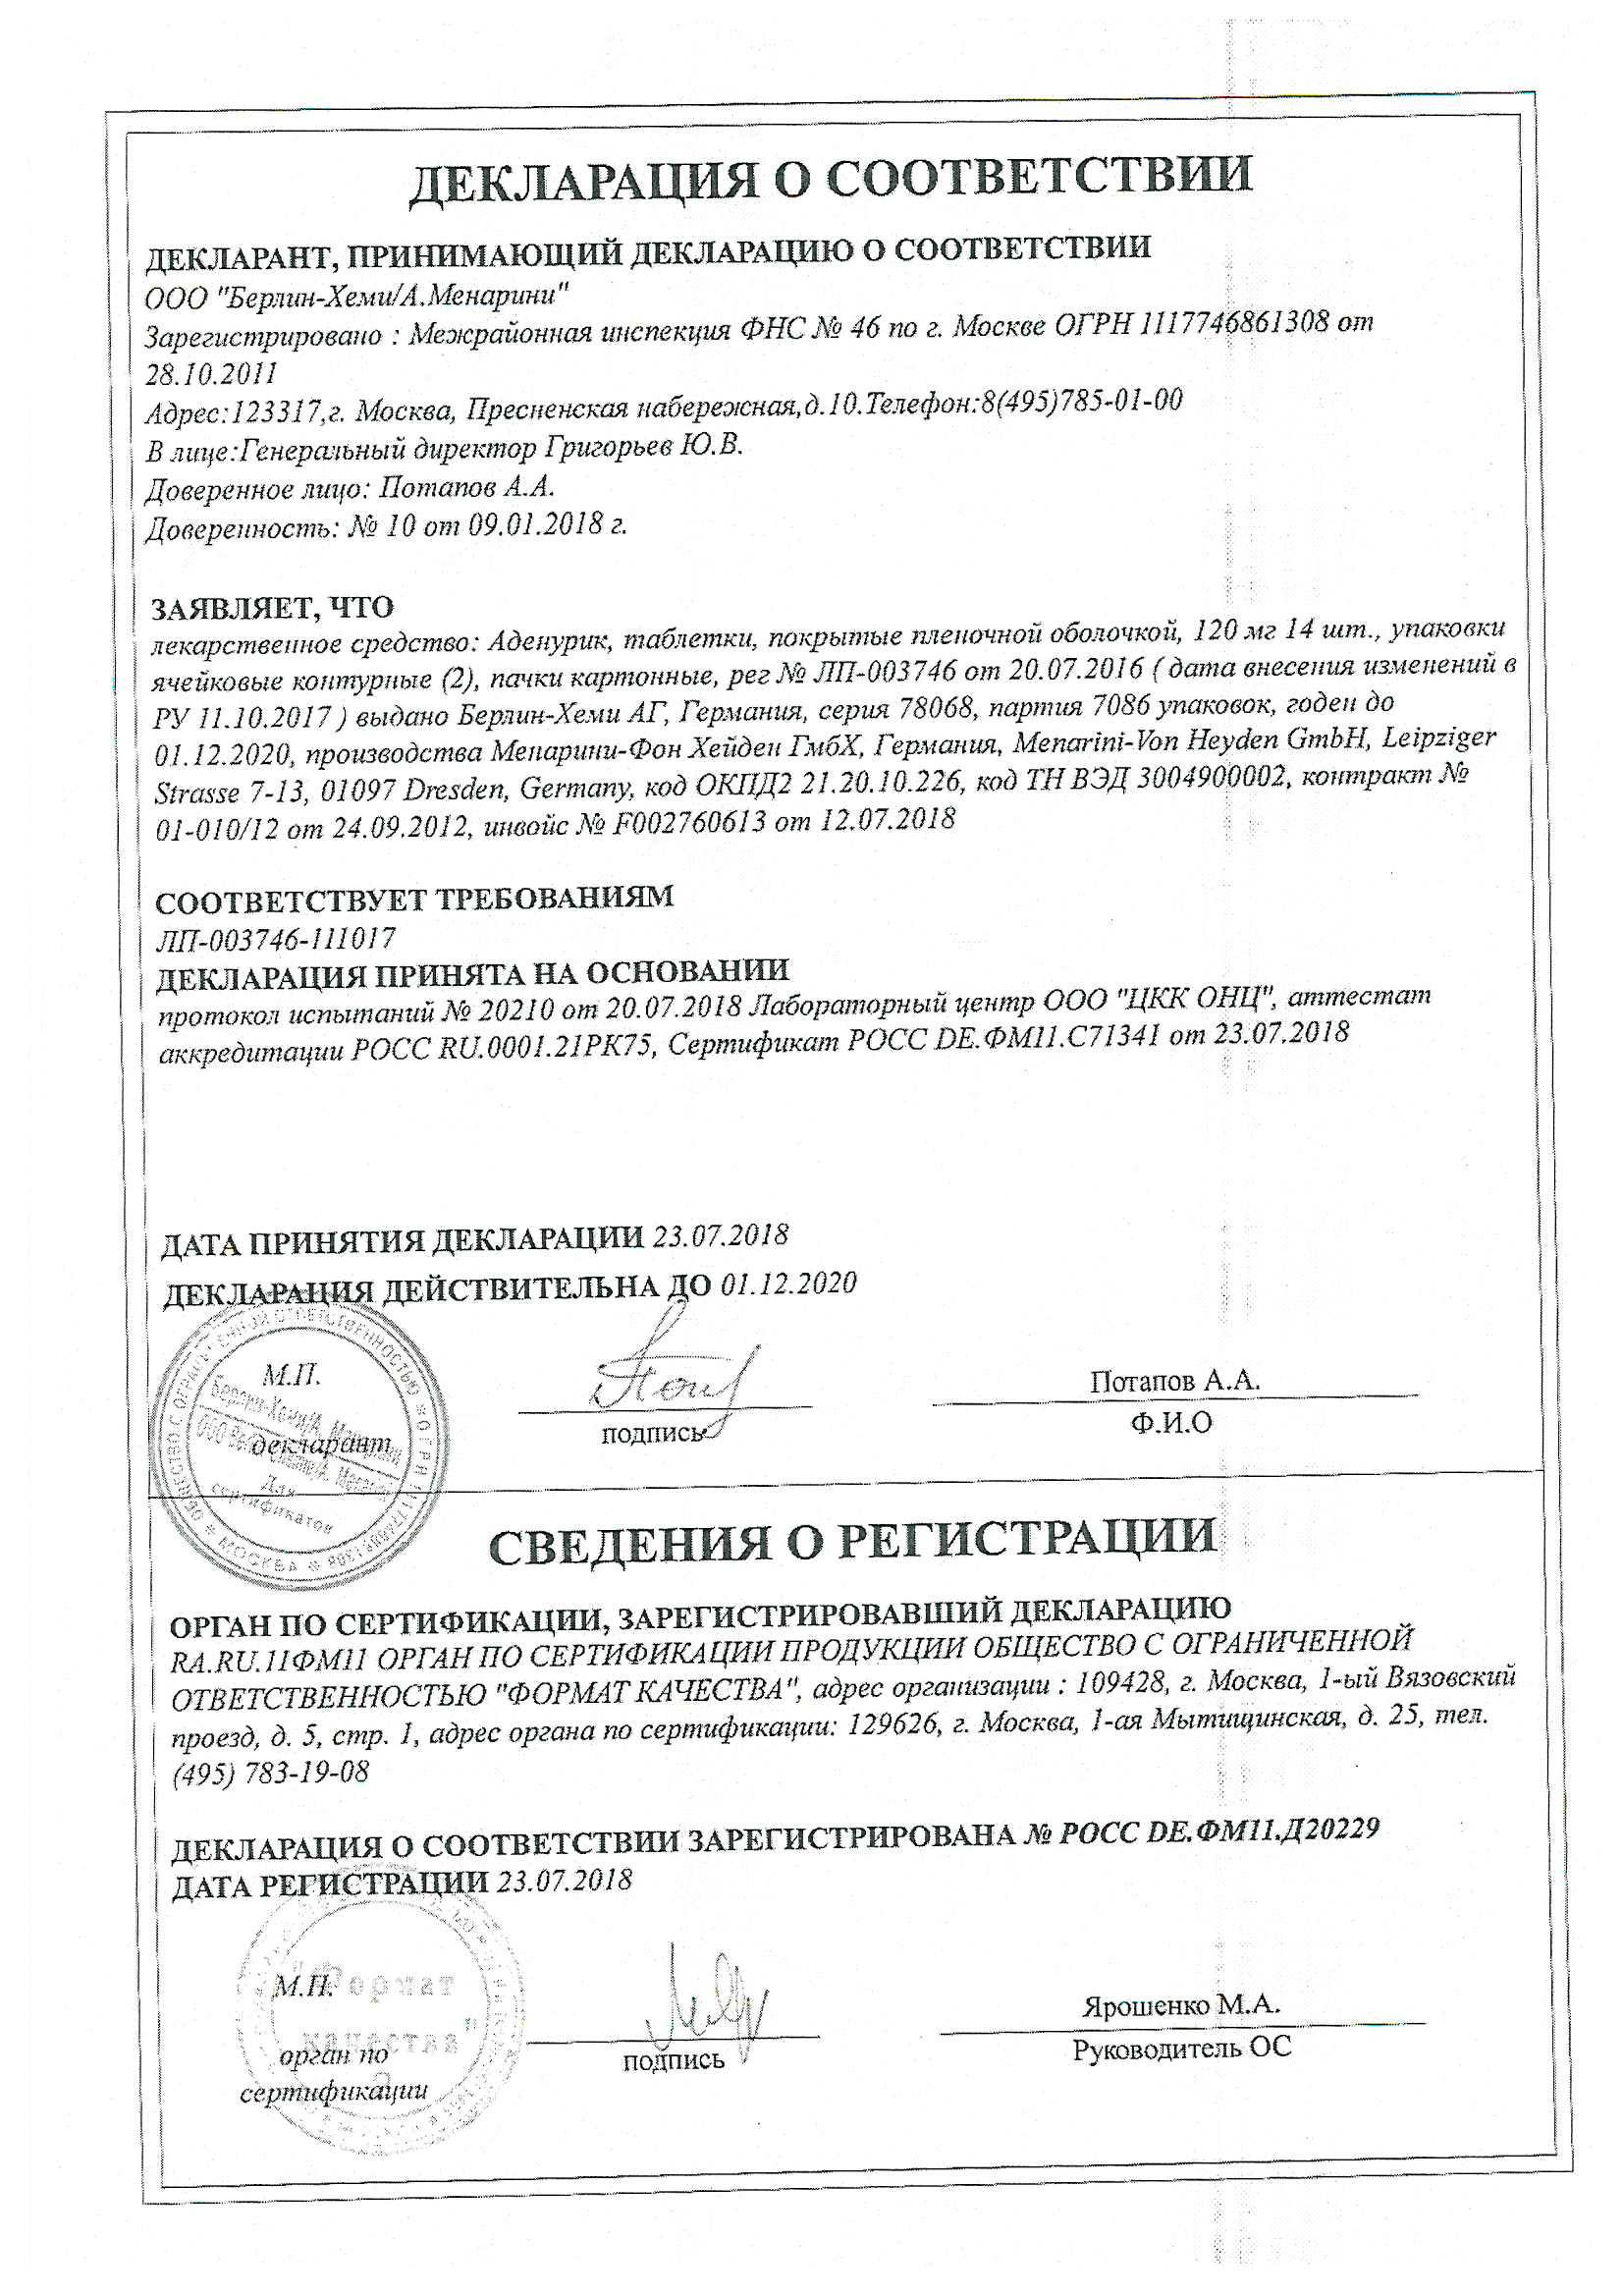 https://avisfarm.com/i/lek/certificates/7771220/193067-01306580.jpg?id=58